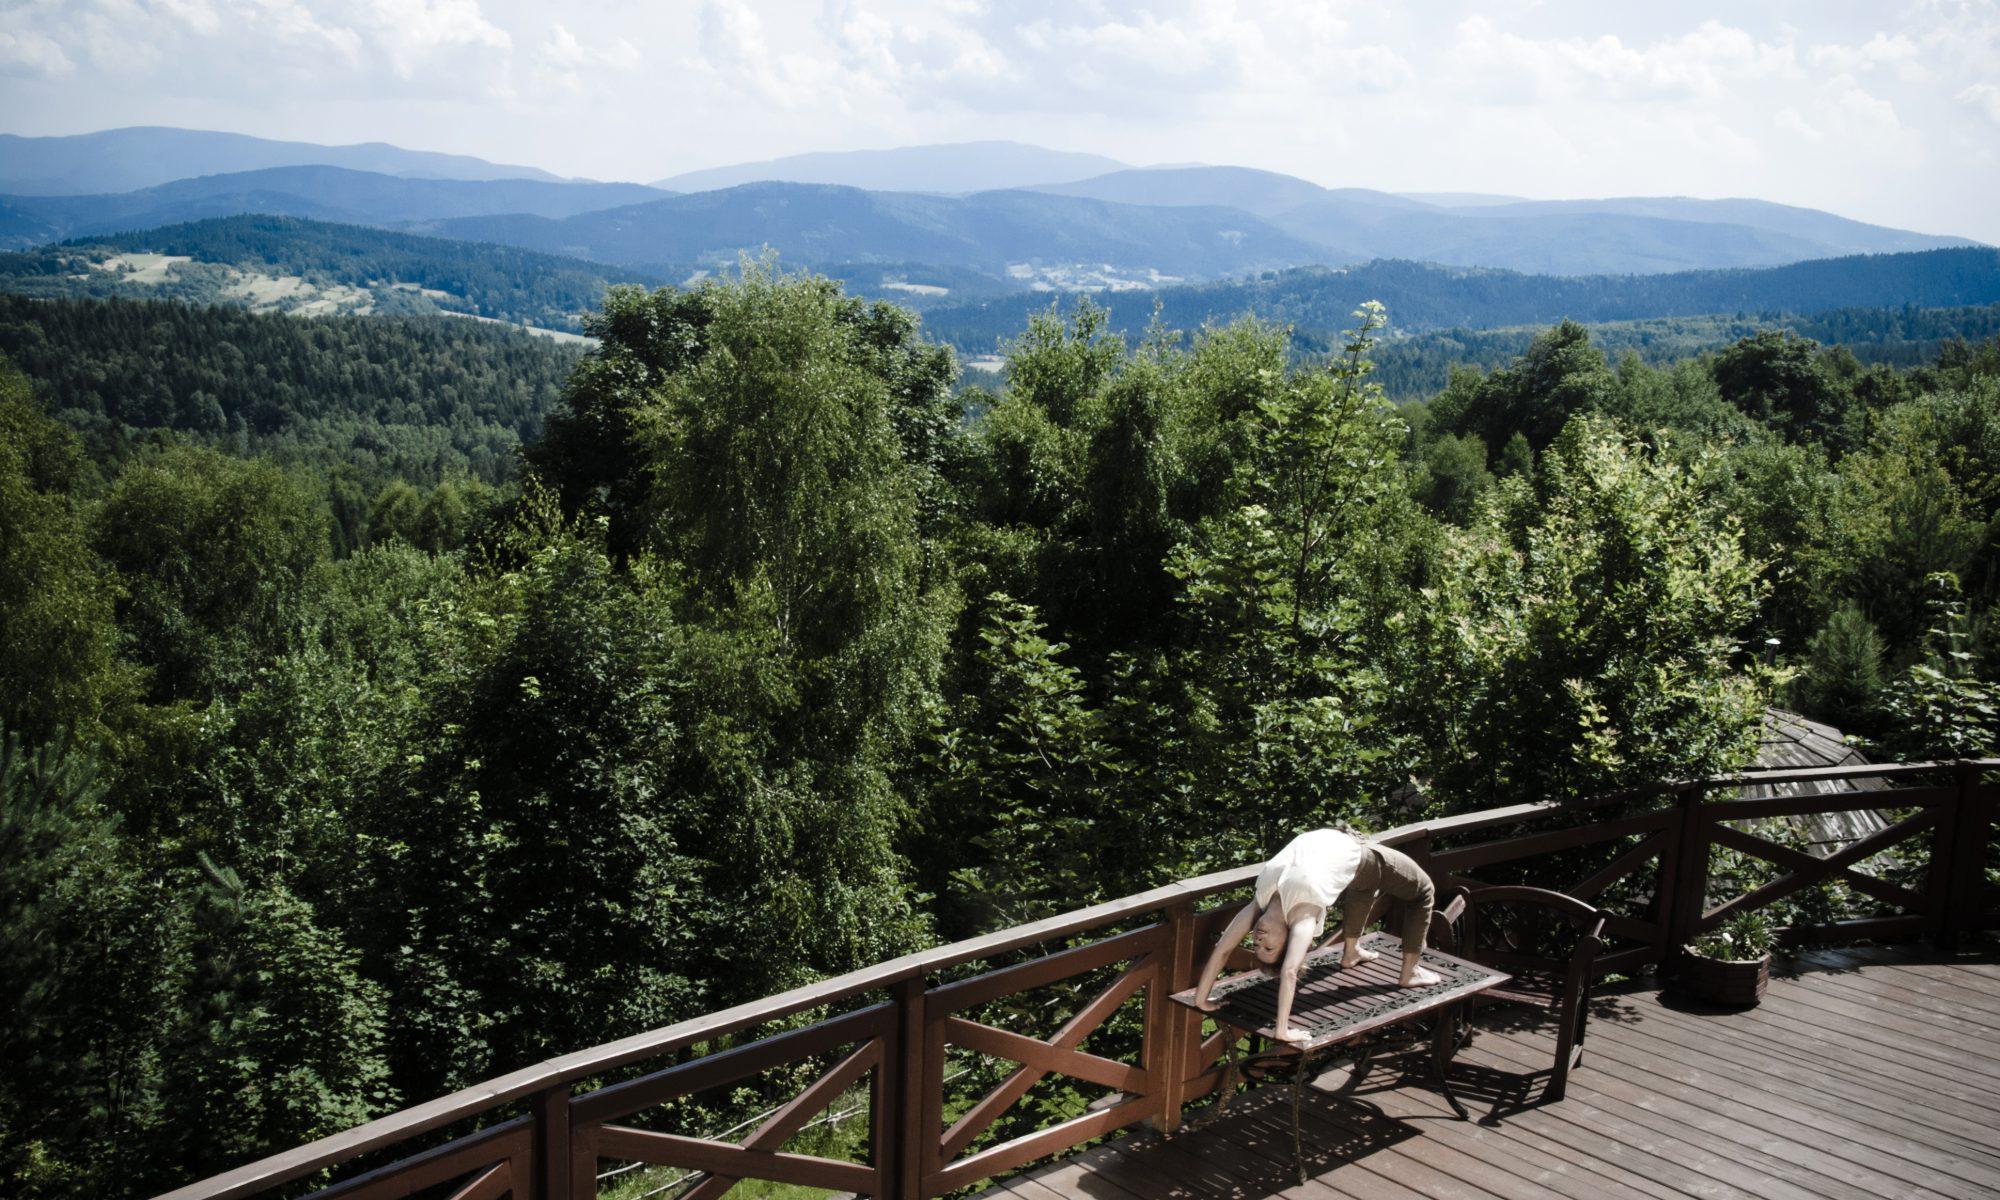 Jogalife.pl - joga, wegeterianizm i ekologia